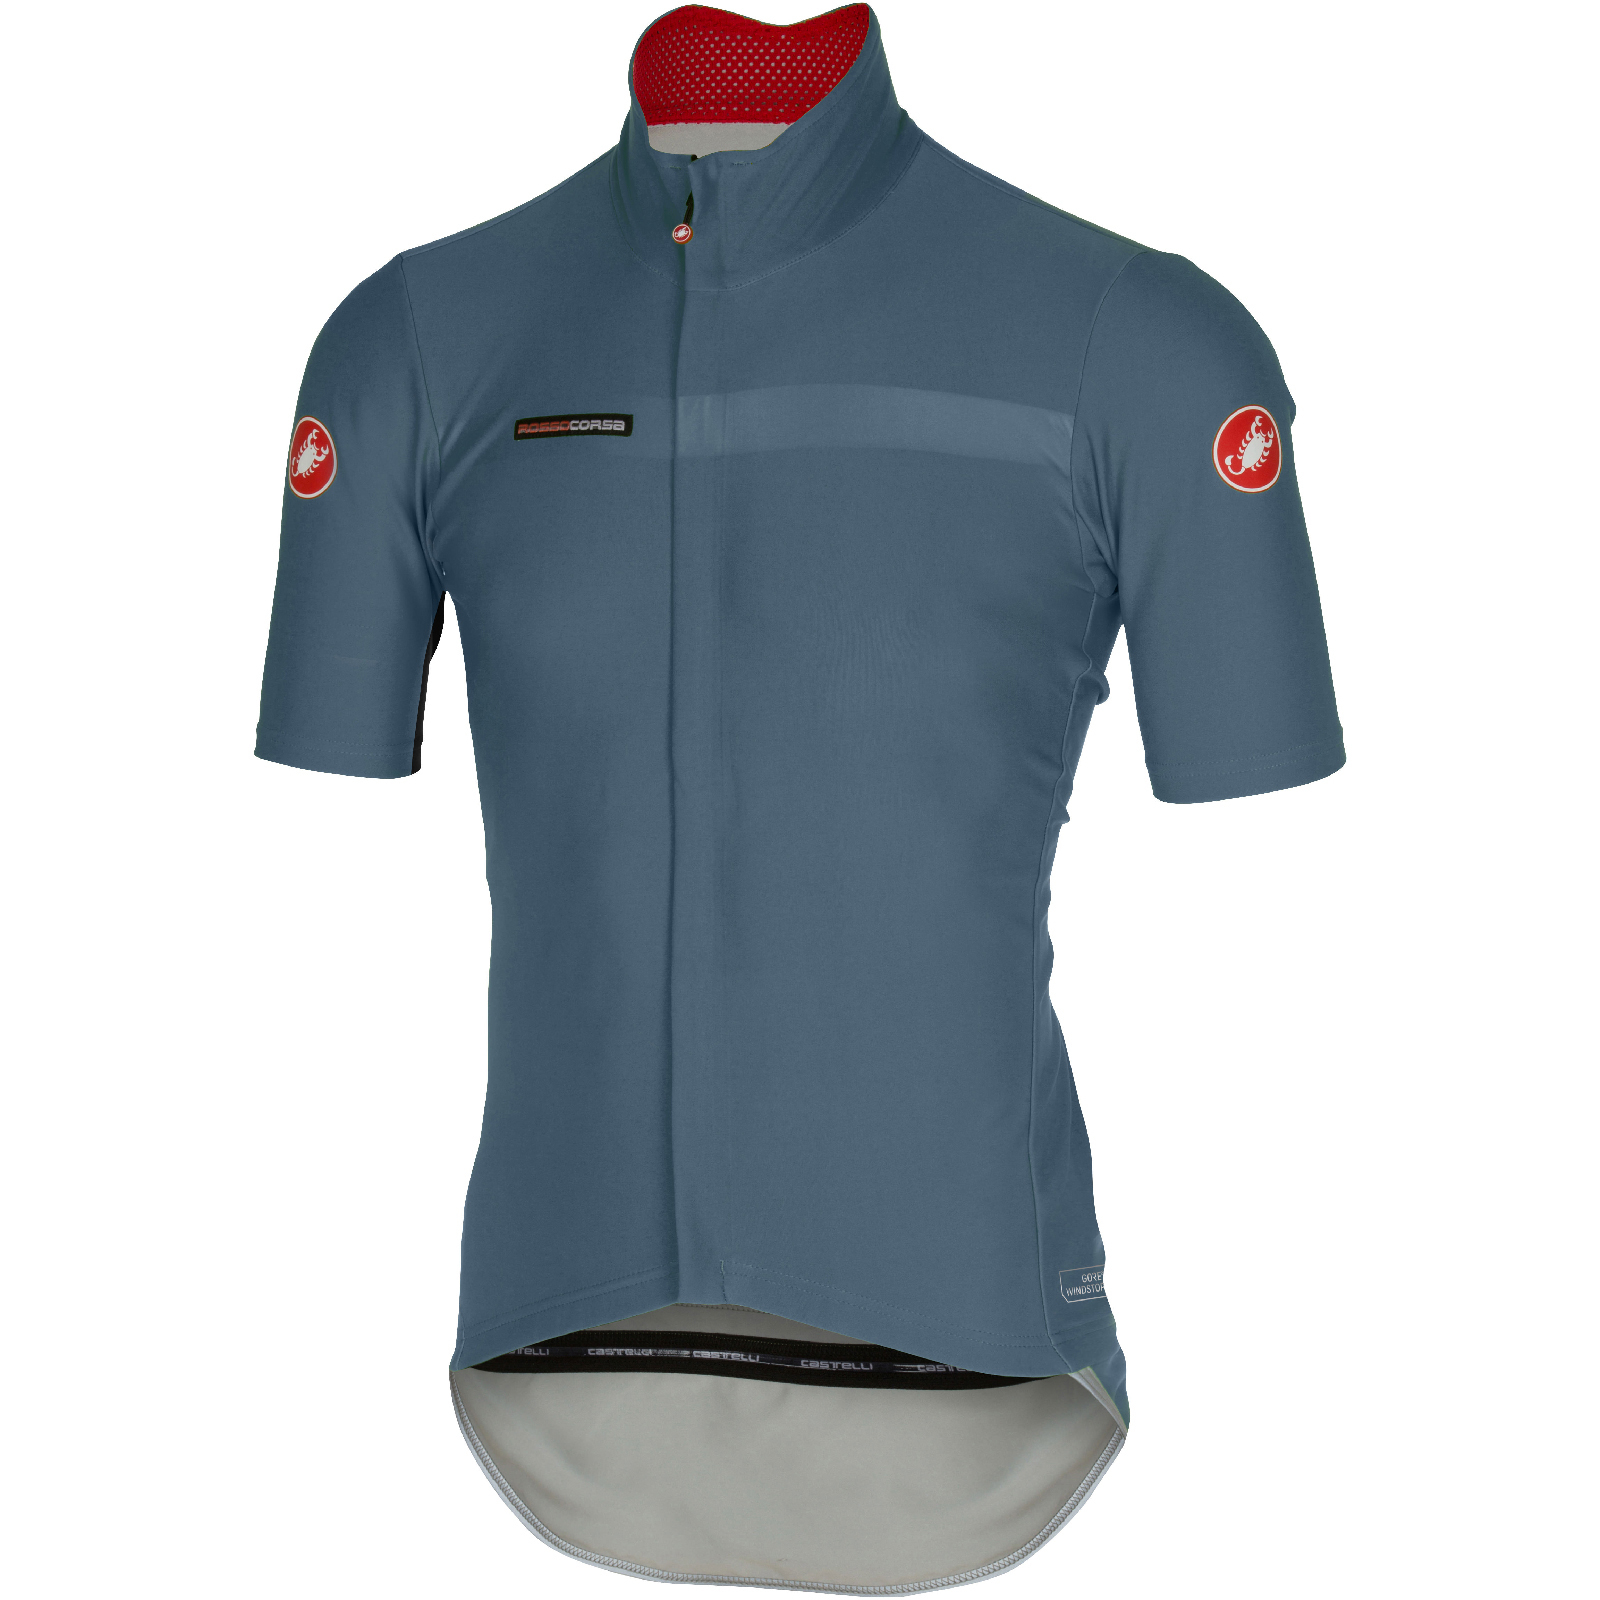 f31d4c482 Castelli Gabba 2 Short Sleeve Jersey - Mirage Grey